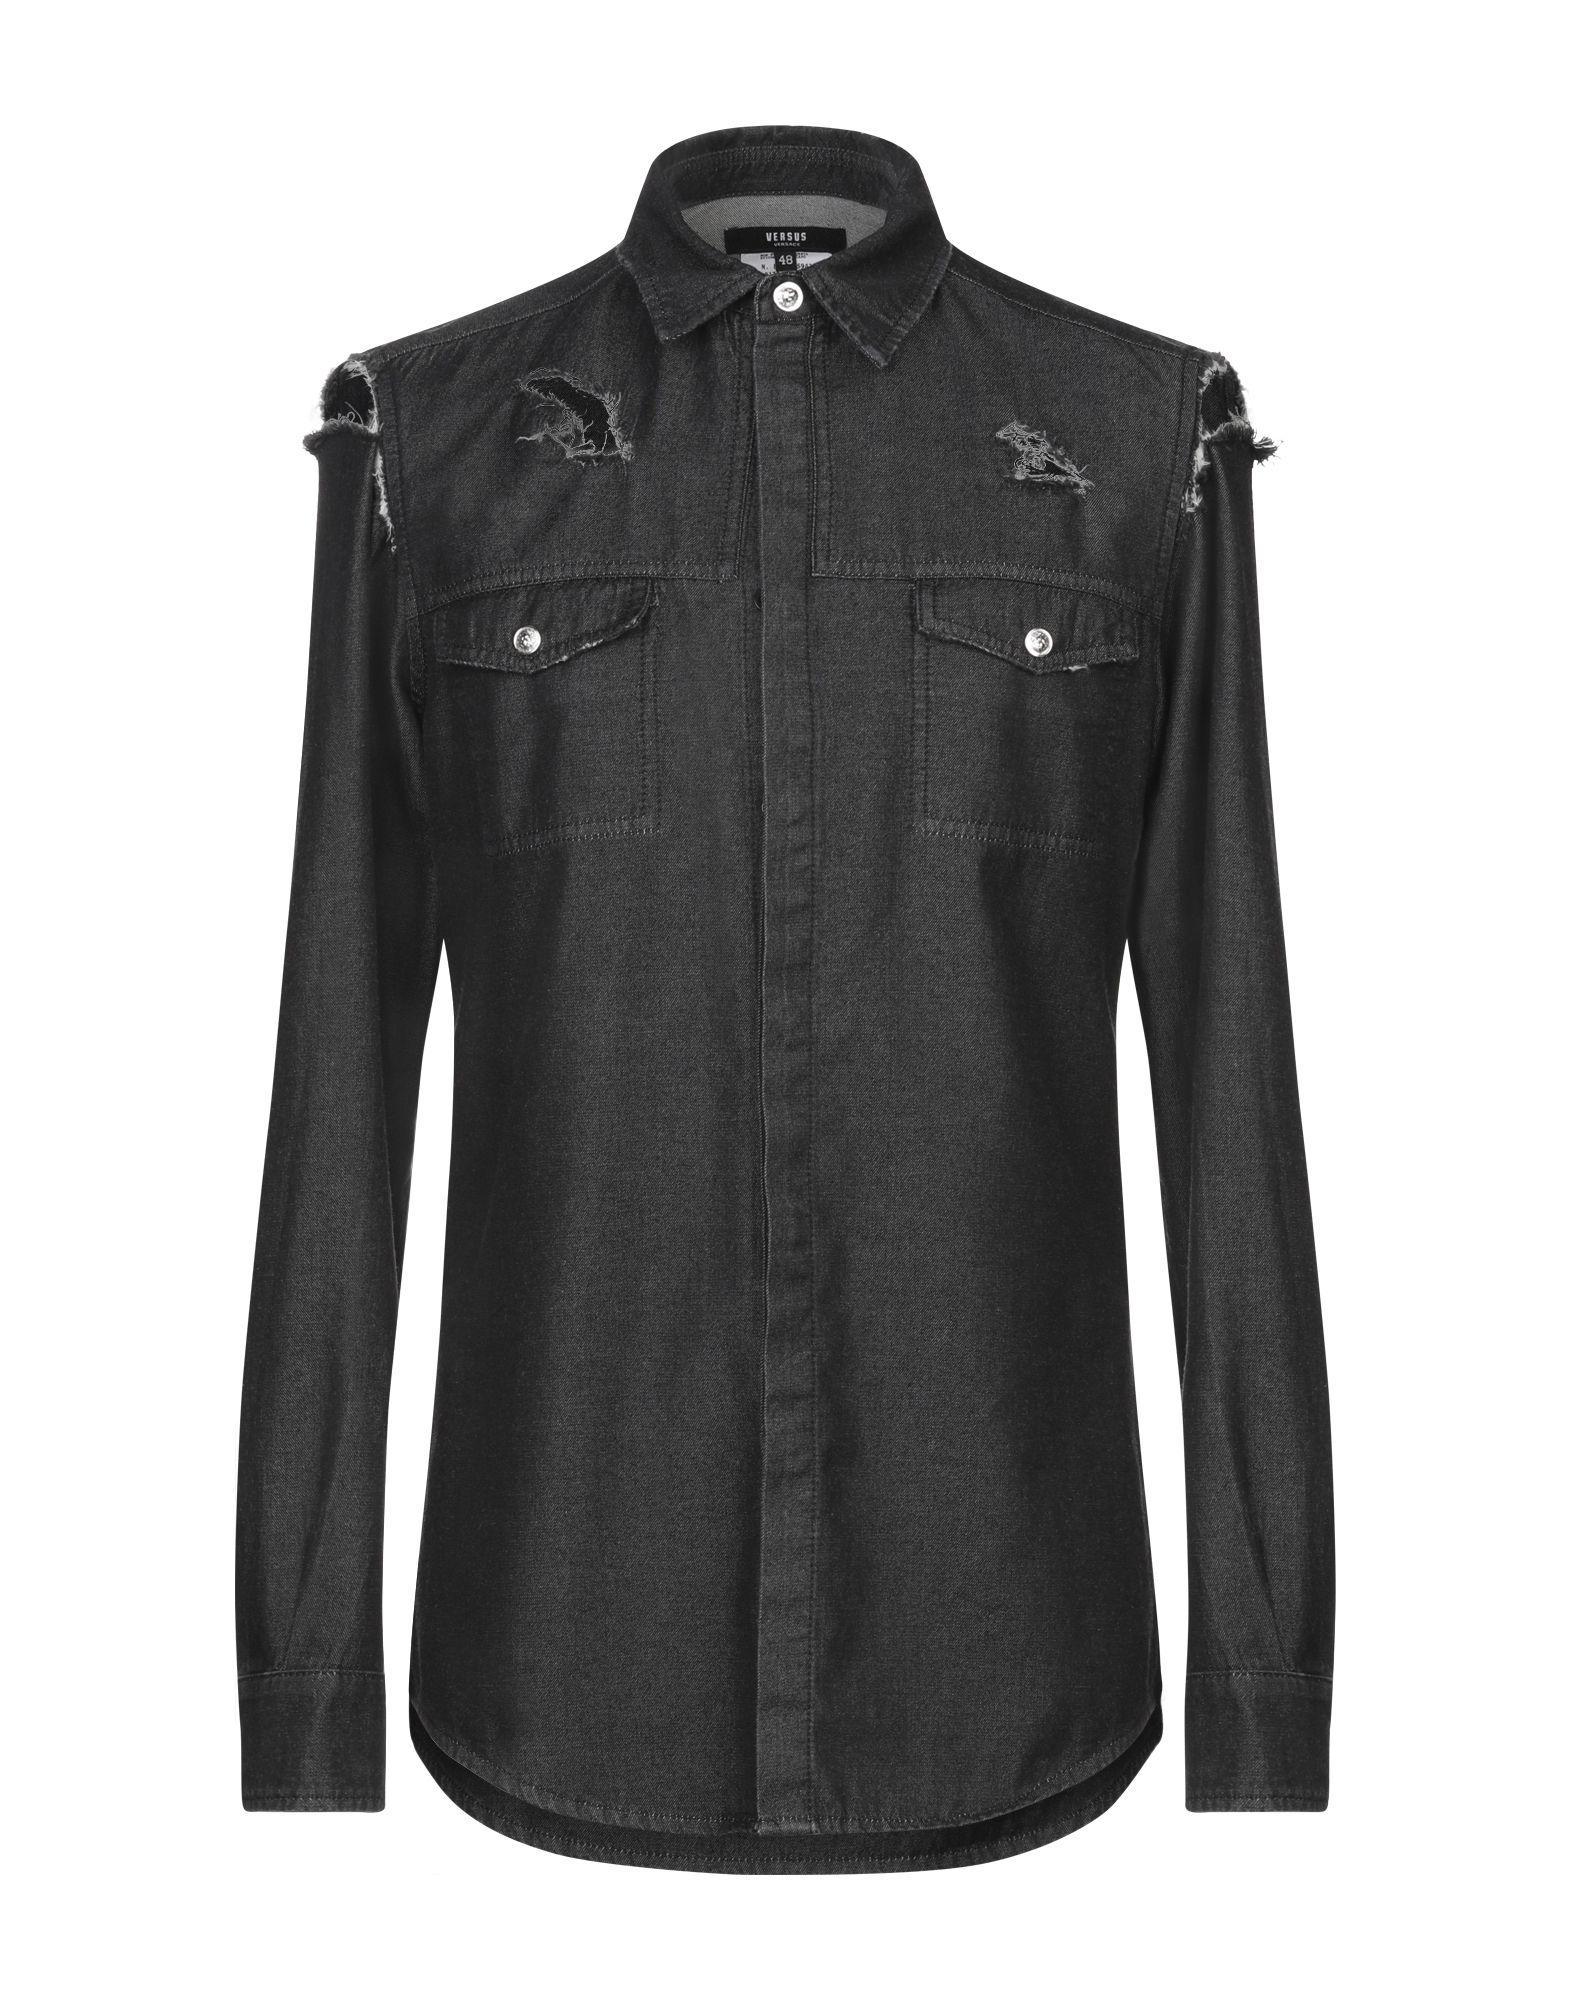 Camicia Di Jeans Versus Versace uomo uomo uomo - 42747786TM e09